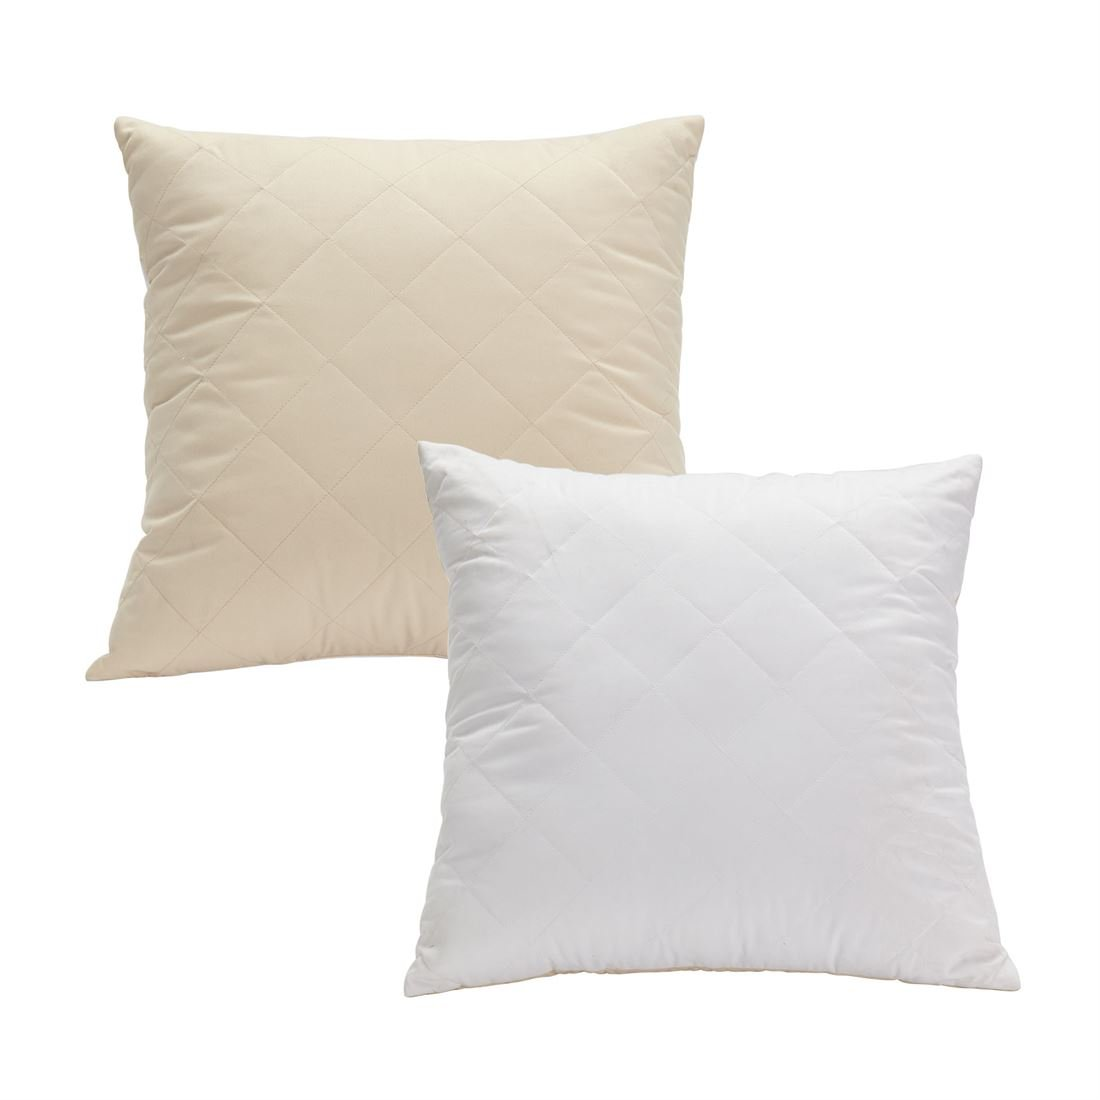 Brylanehome Studioリバーシブルキルト風スクエア枕 17234800121mk0~0 B074GW5DW2Oatmeal White